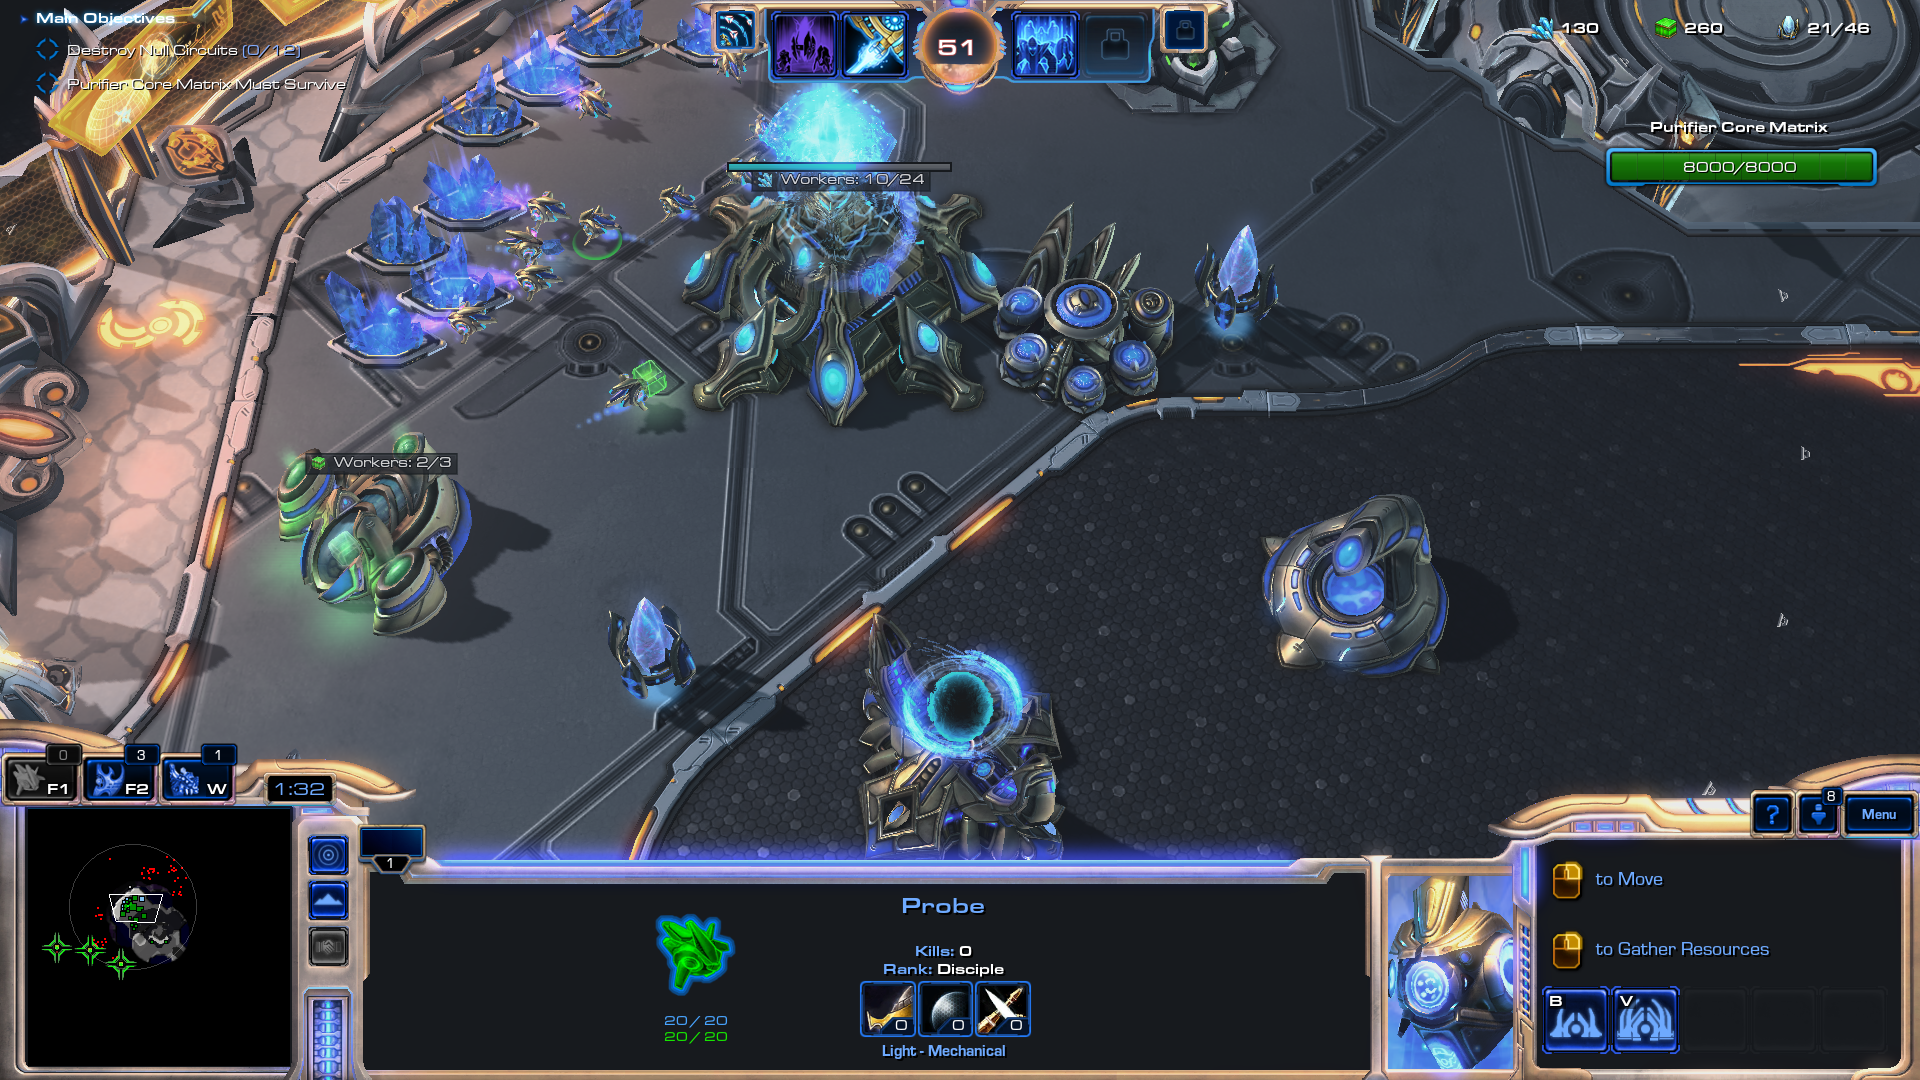 StarCraft II en mode campagne